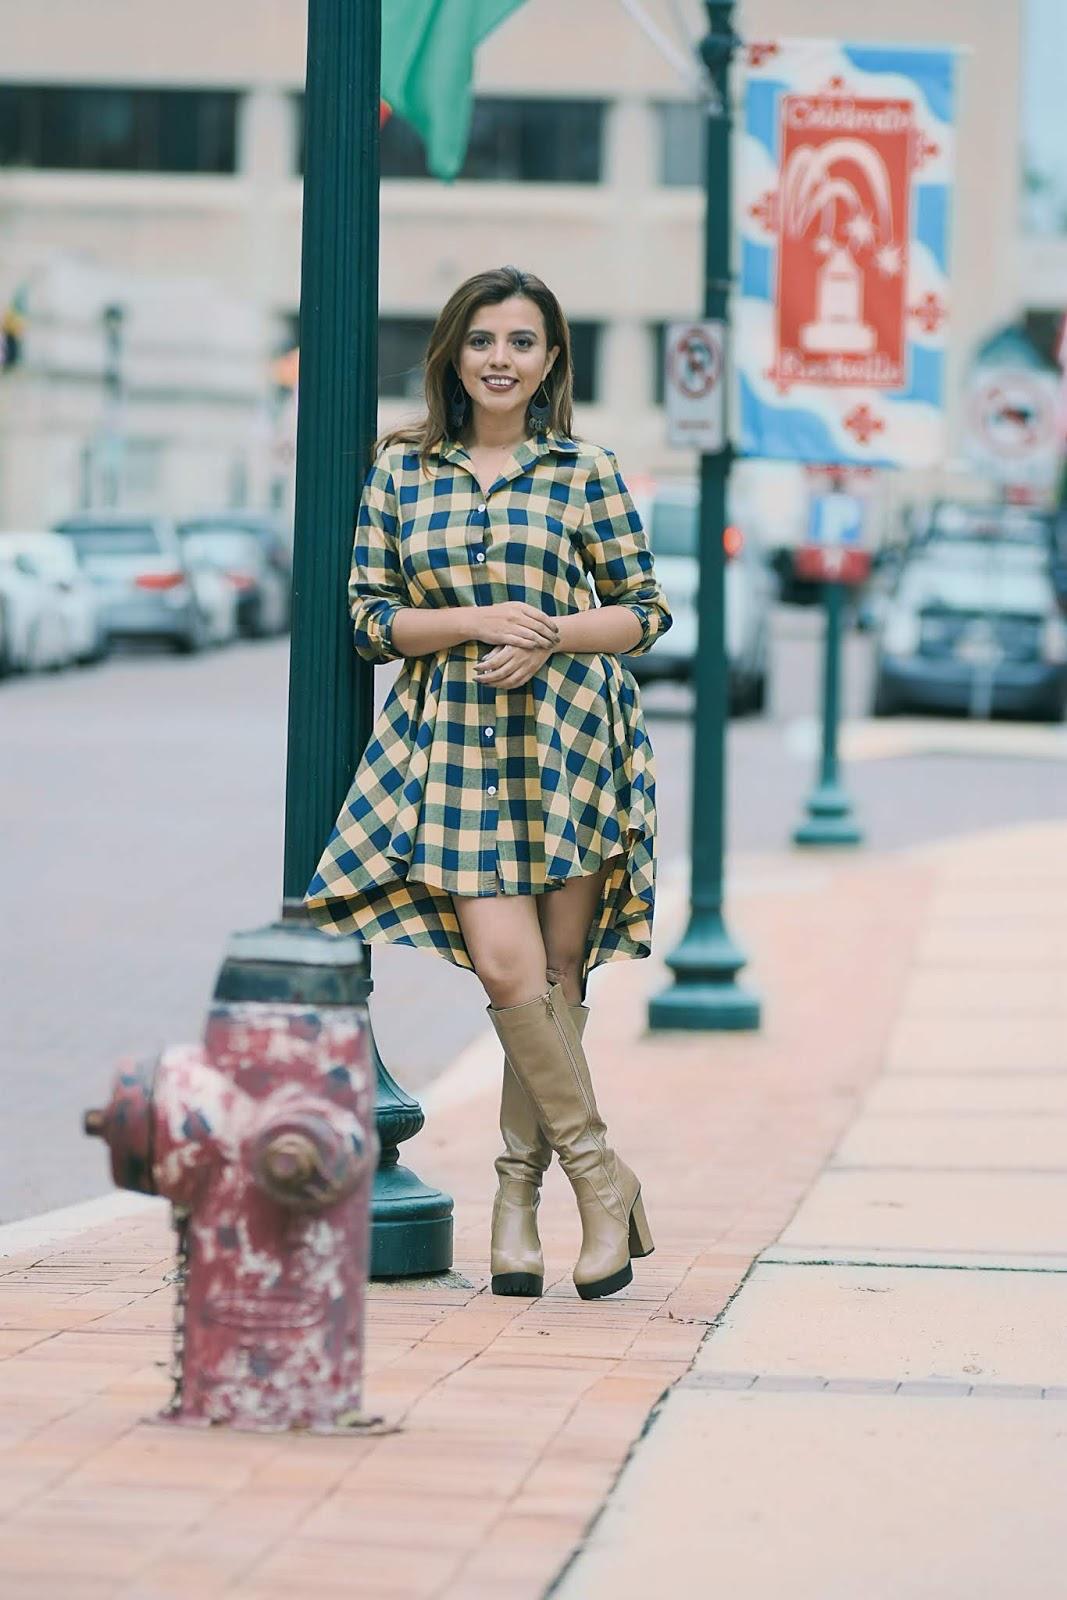 Vestido Camisero En Estampado Tartán-MariEstilo-SheIn-FashionBlogger-lookoftheday-fallfashion-dcblogger-marisolflamenco-